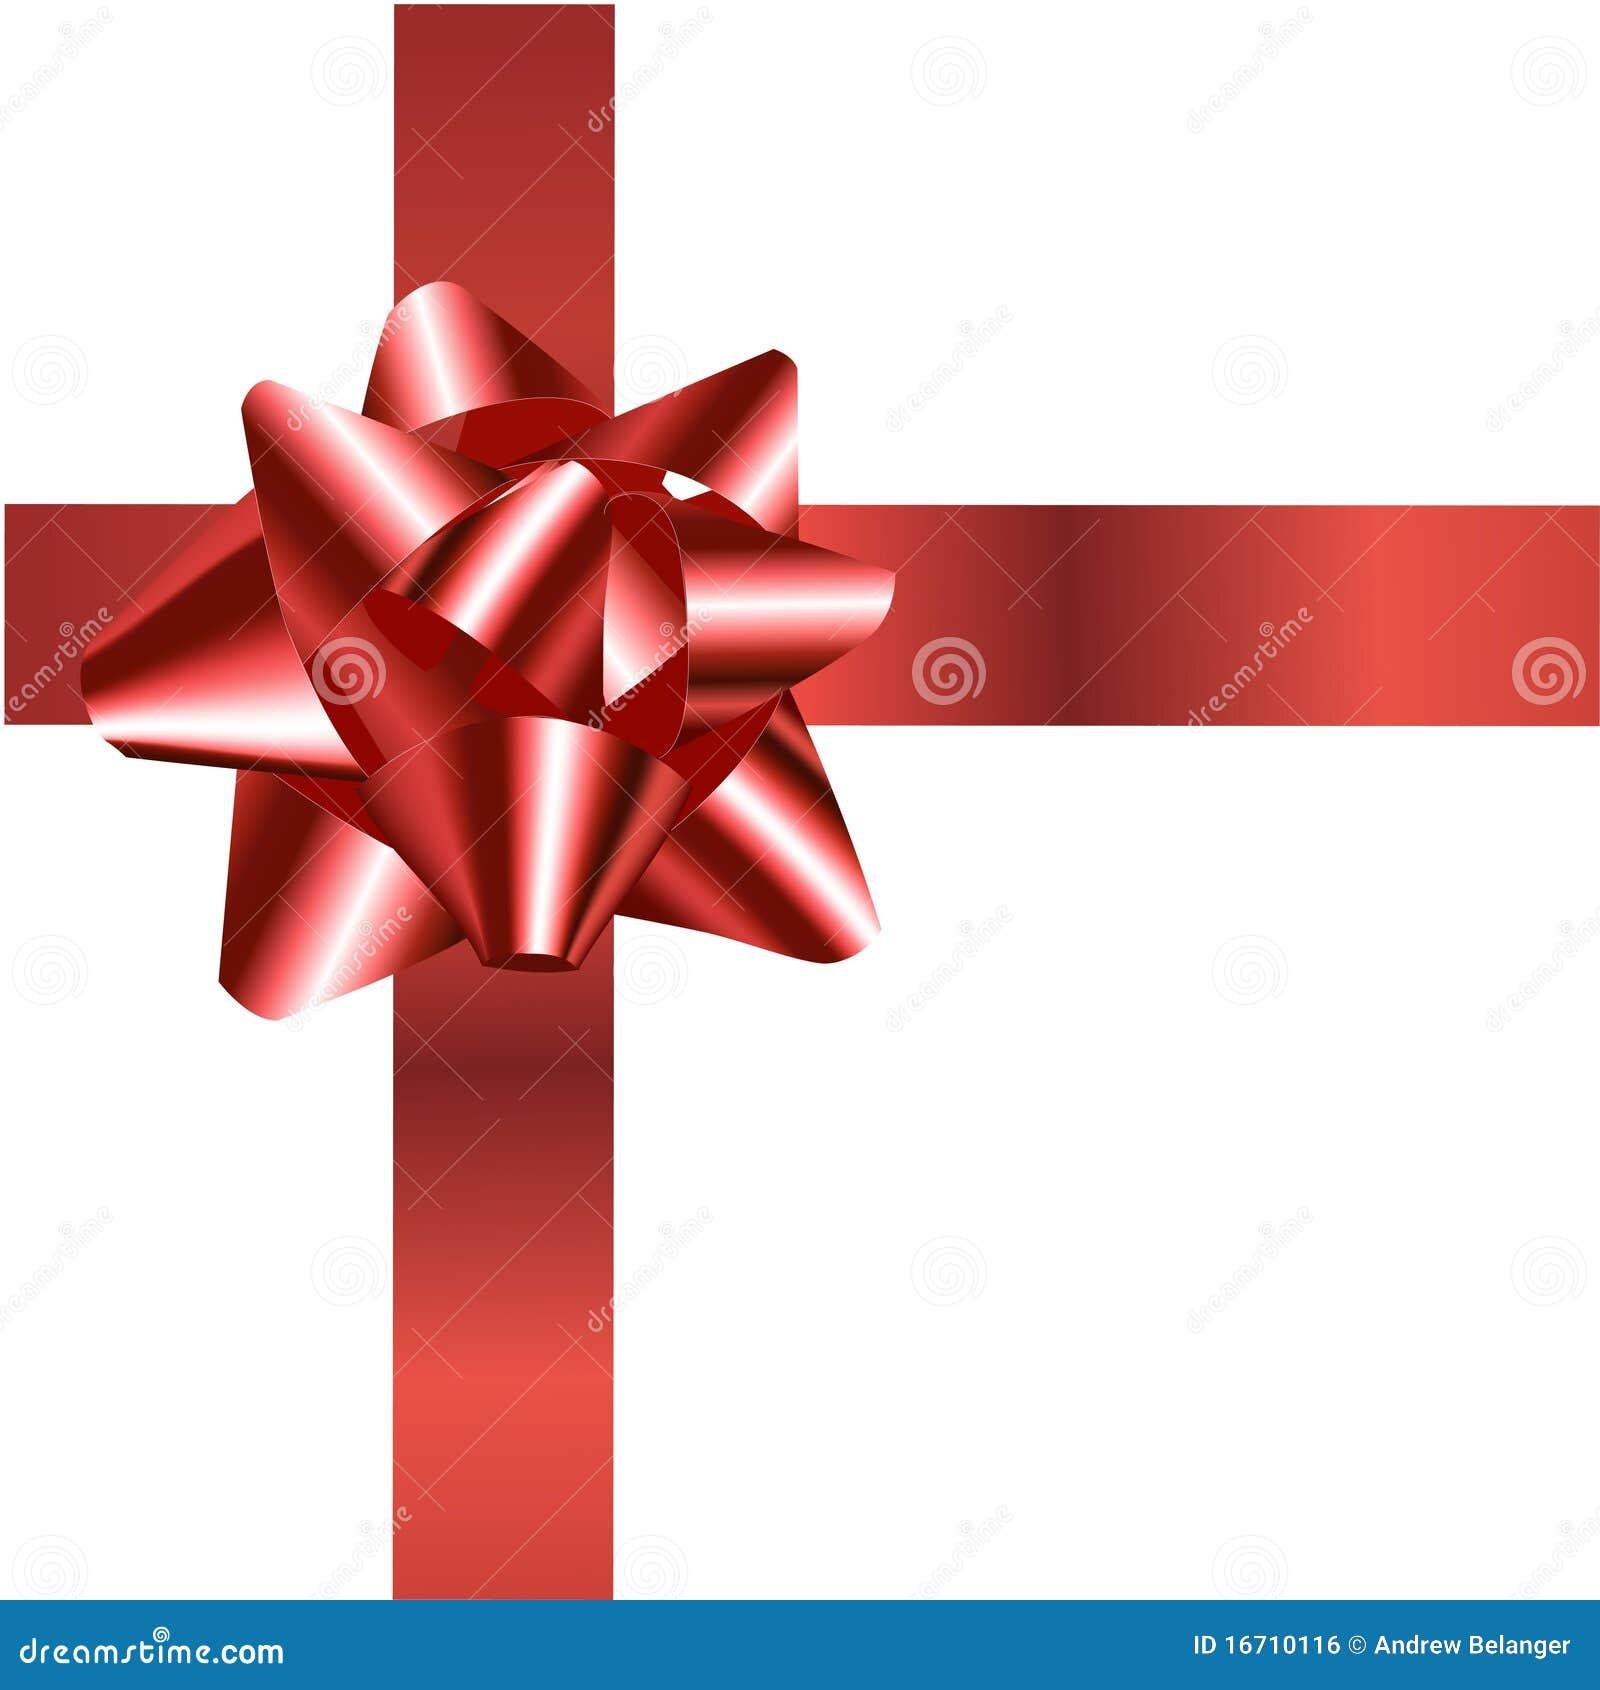 Present Ribbon And Bow Royalty Free Stock Image Image